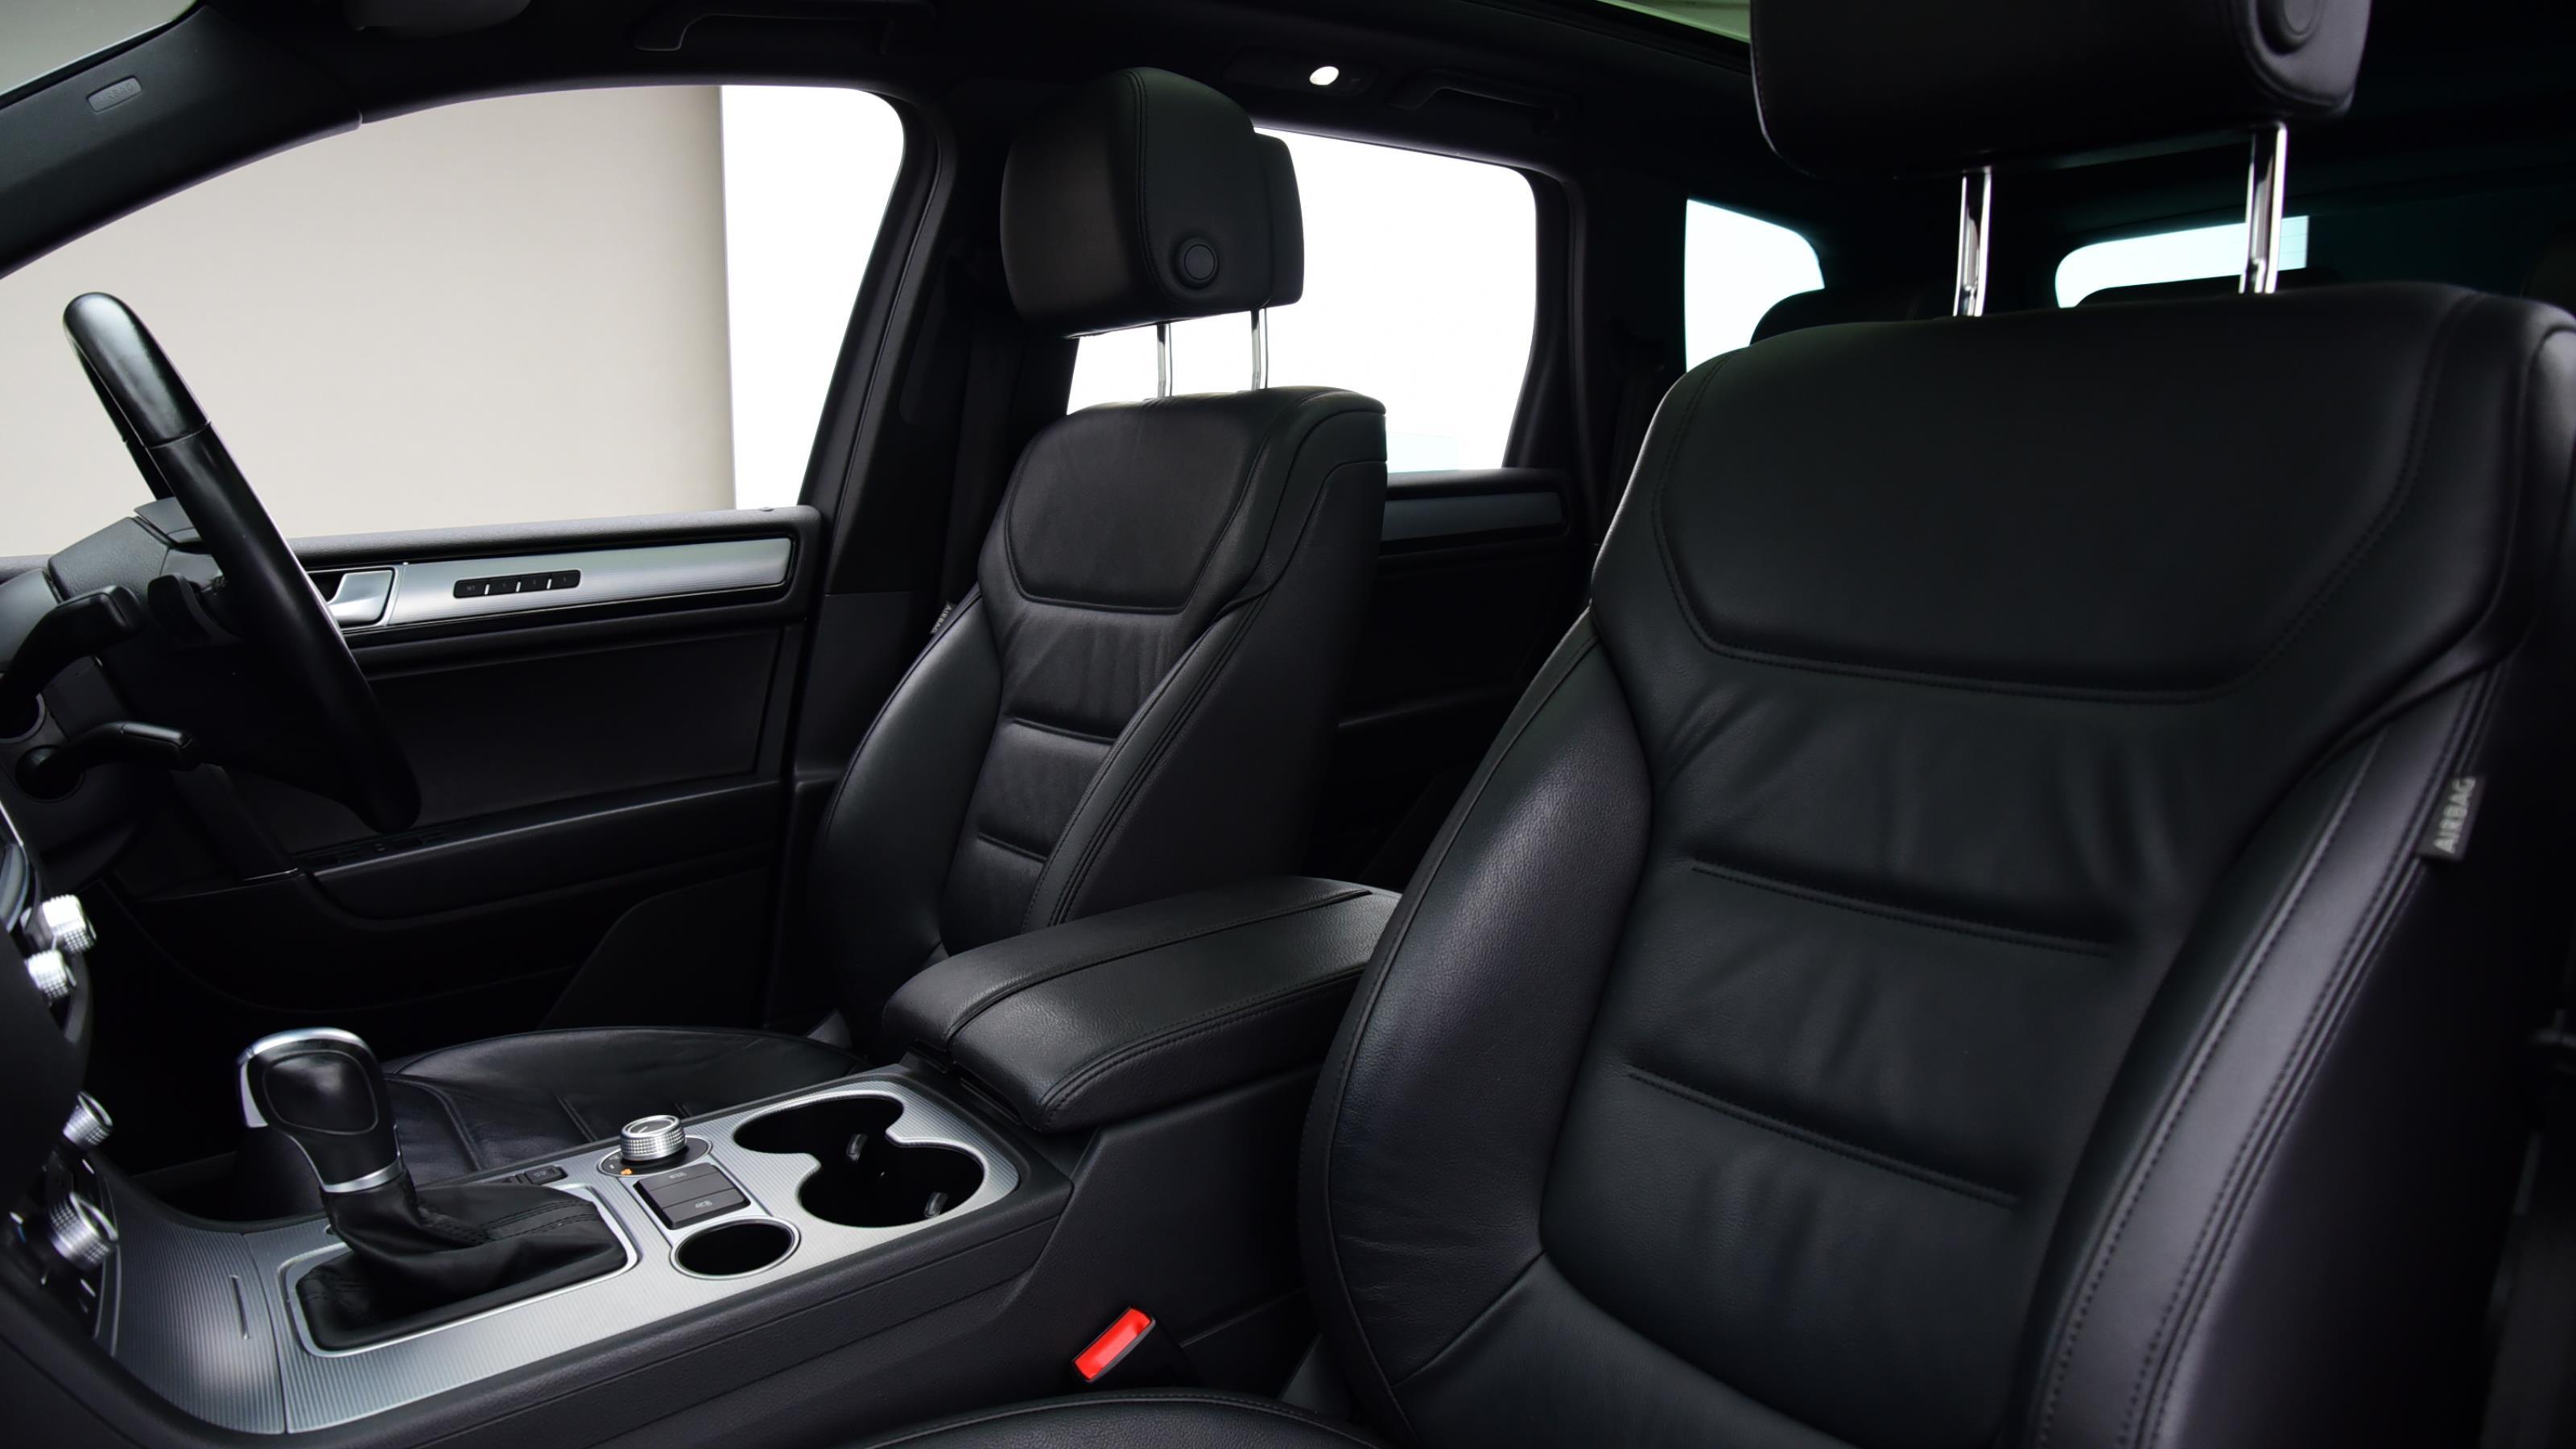 Used 2015 Volkswagen TOUAREG 3.0 V6 TDI BlueMotion Tech 262 R Line 5dr Tip Auto BLACK at Saxton4x4